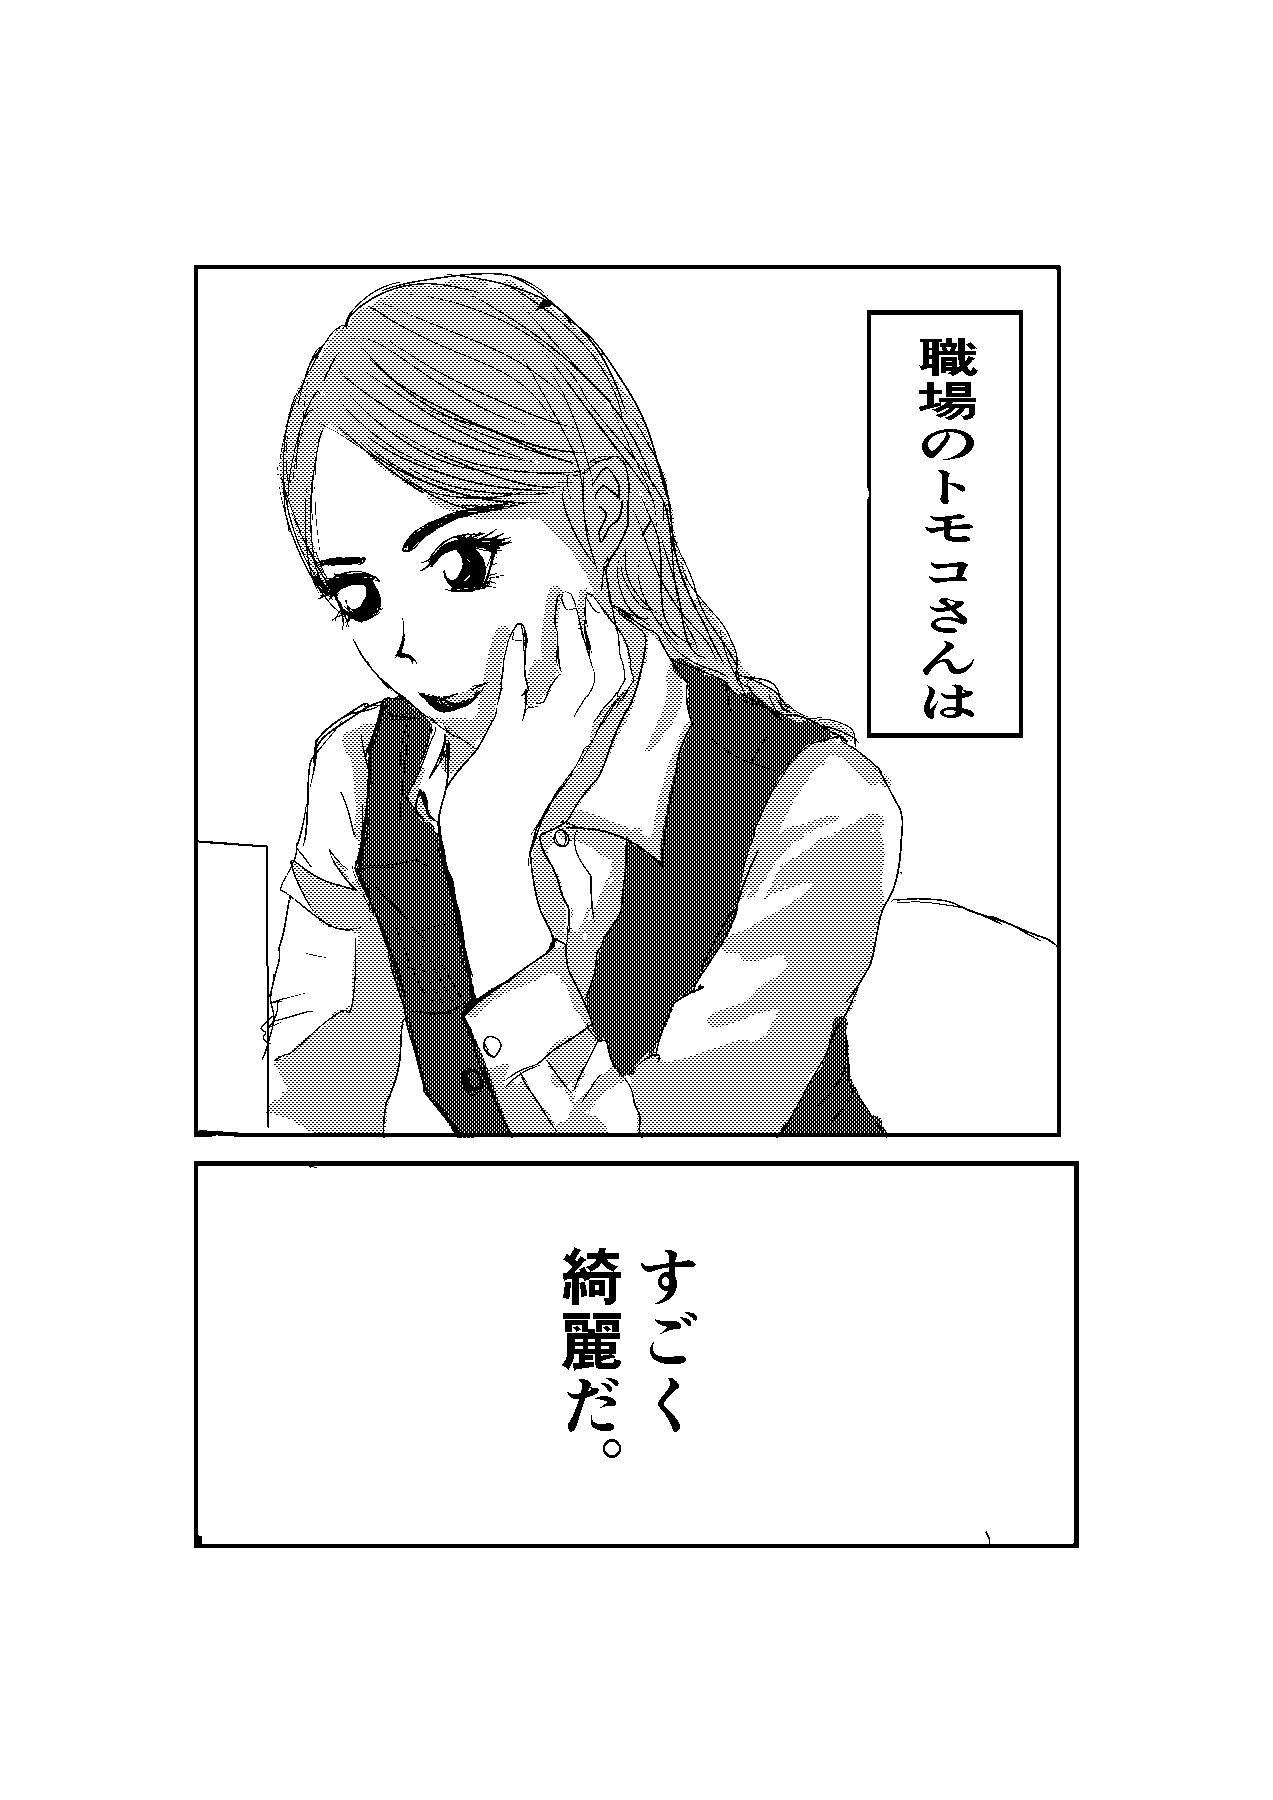 【Sixth Eden 同人】職場のエッチなトモコさん~お悩み相談編~